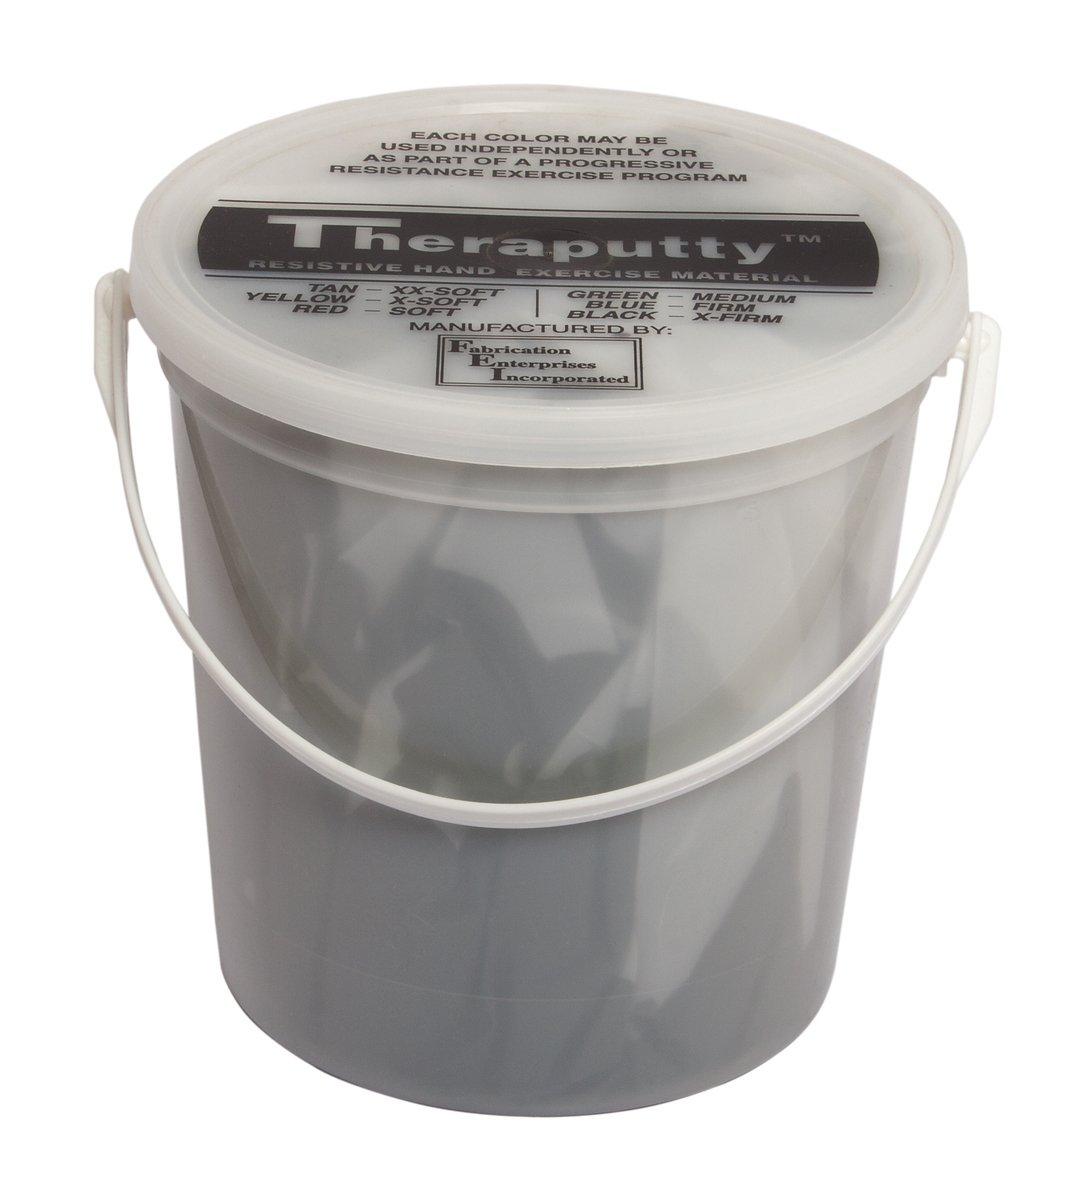 CanDo TheraPutty Plus Anti-microbial, Black: X-Firm, 5 lb